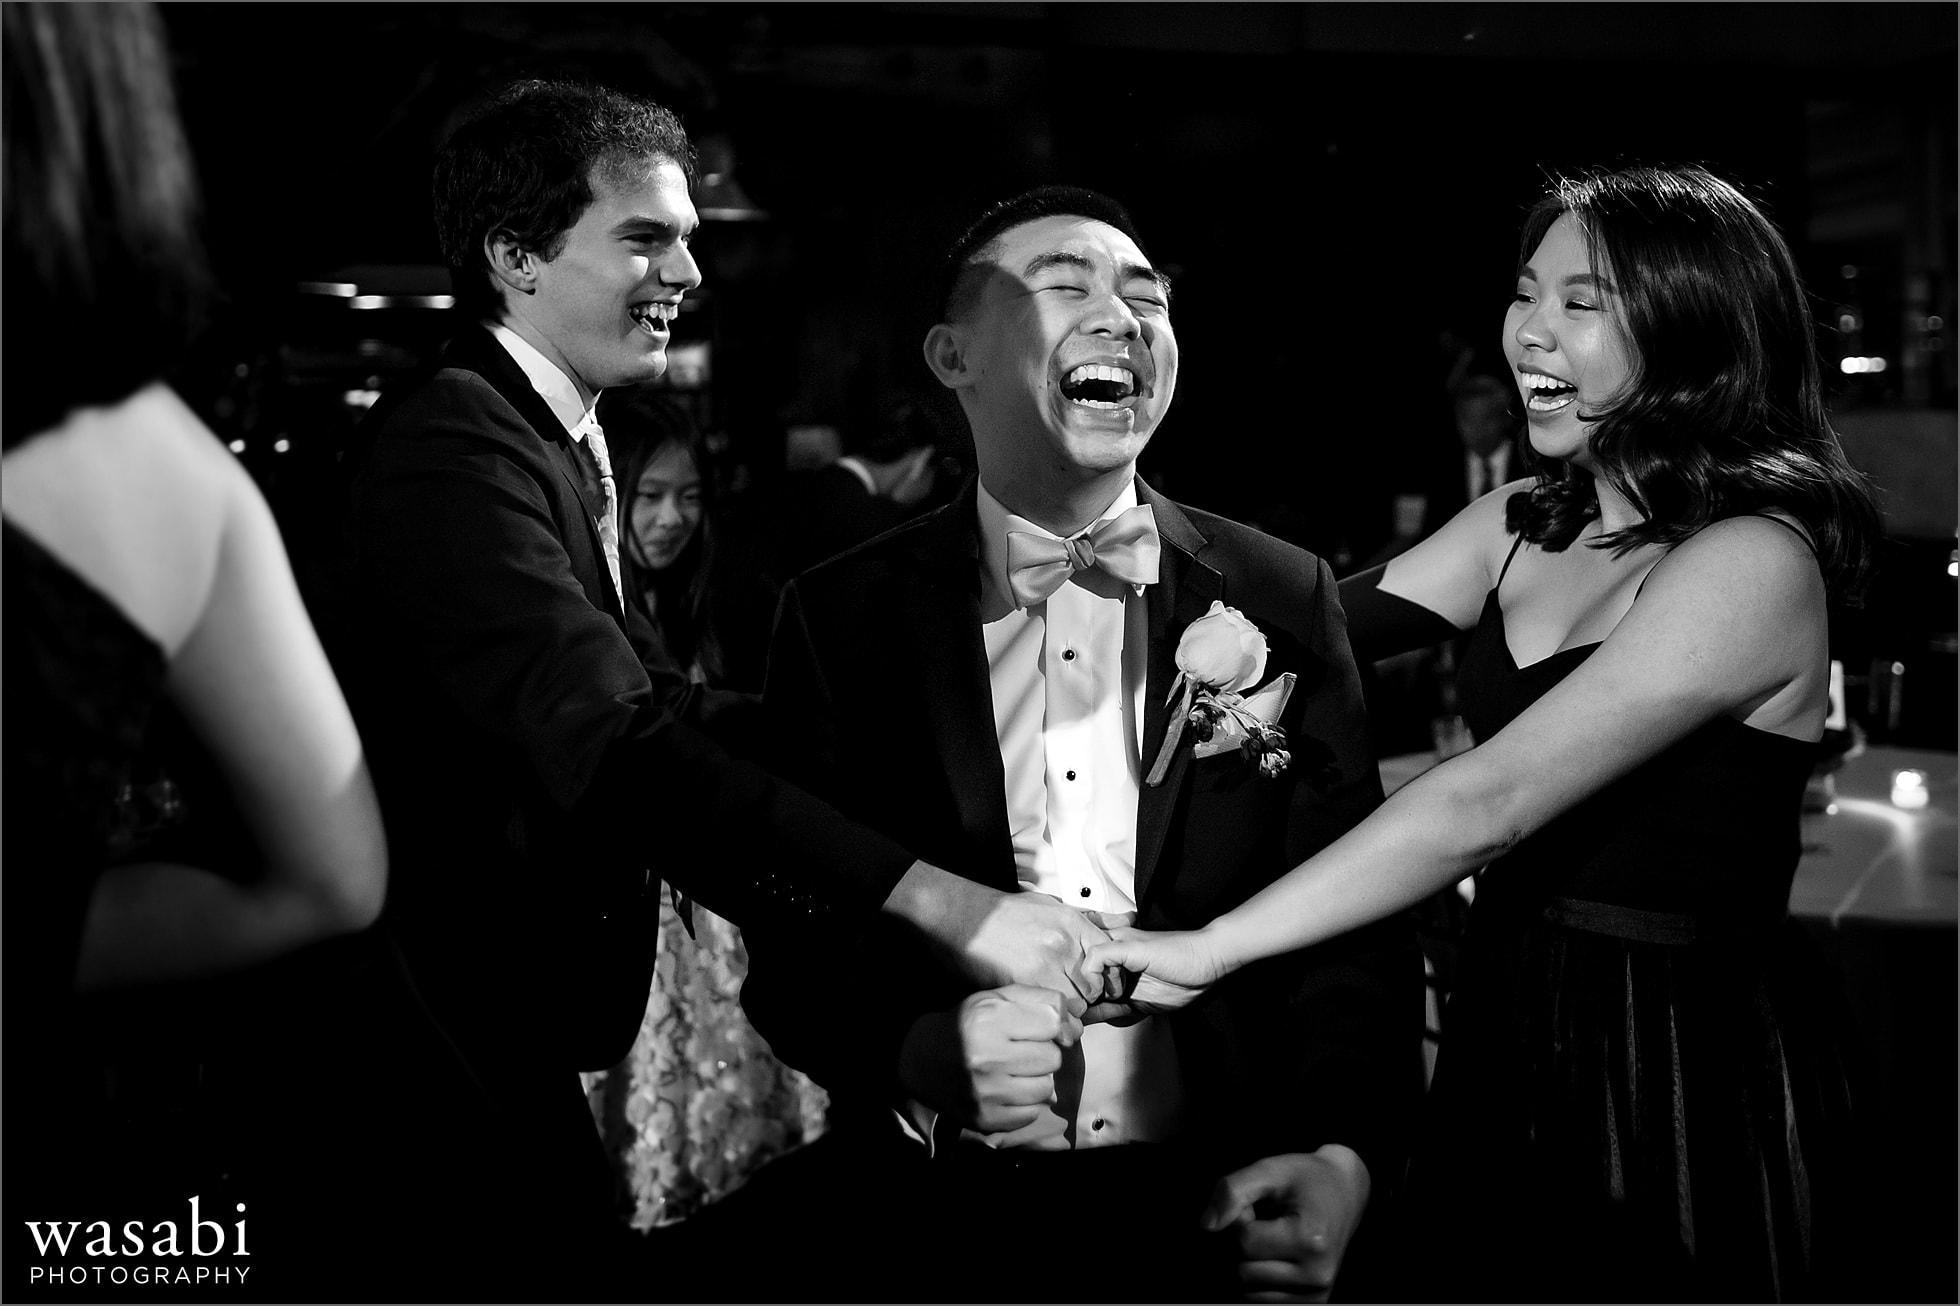 wedding guests dance during Montgomery Club wedding reception in Chicago